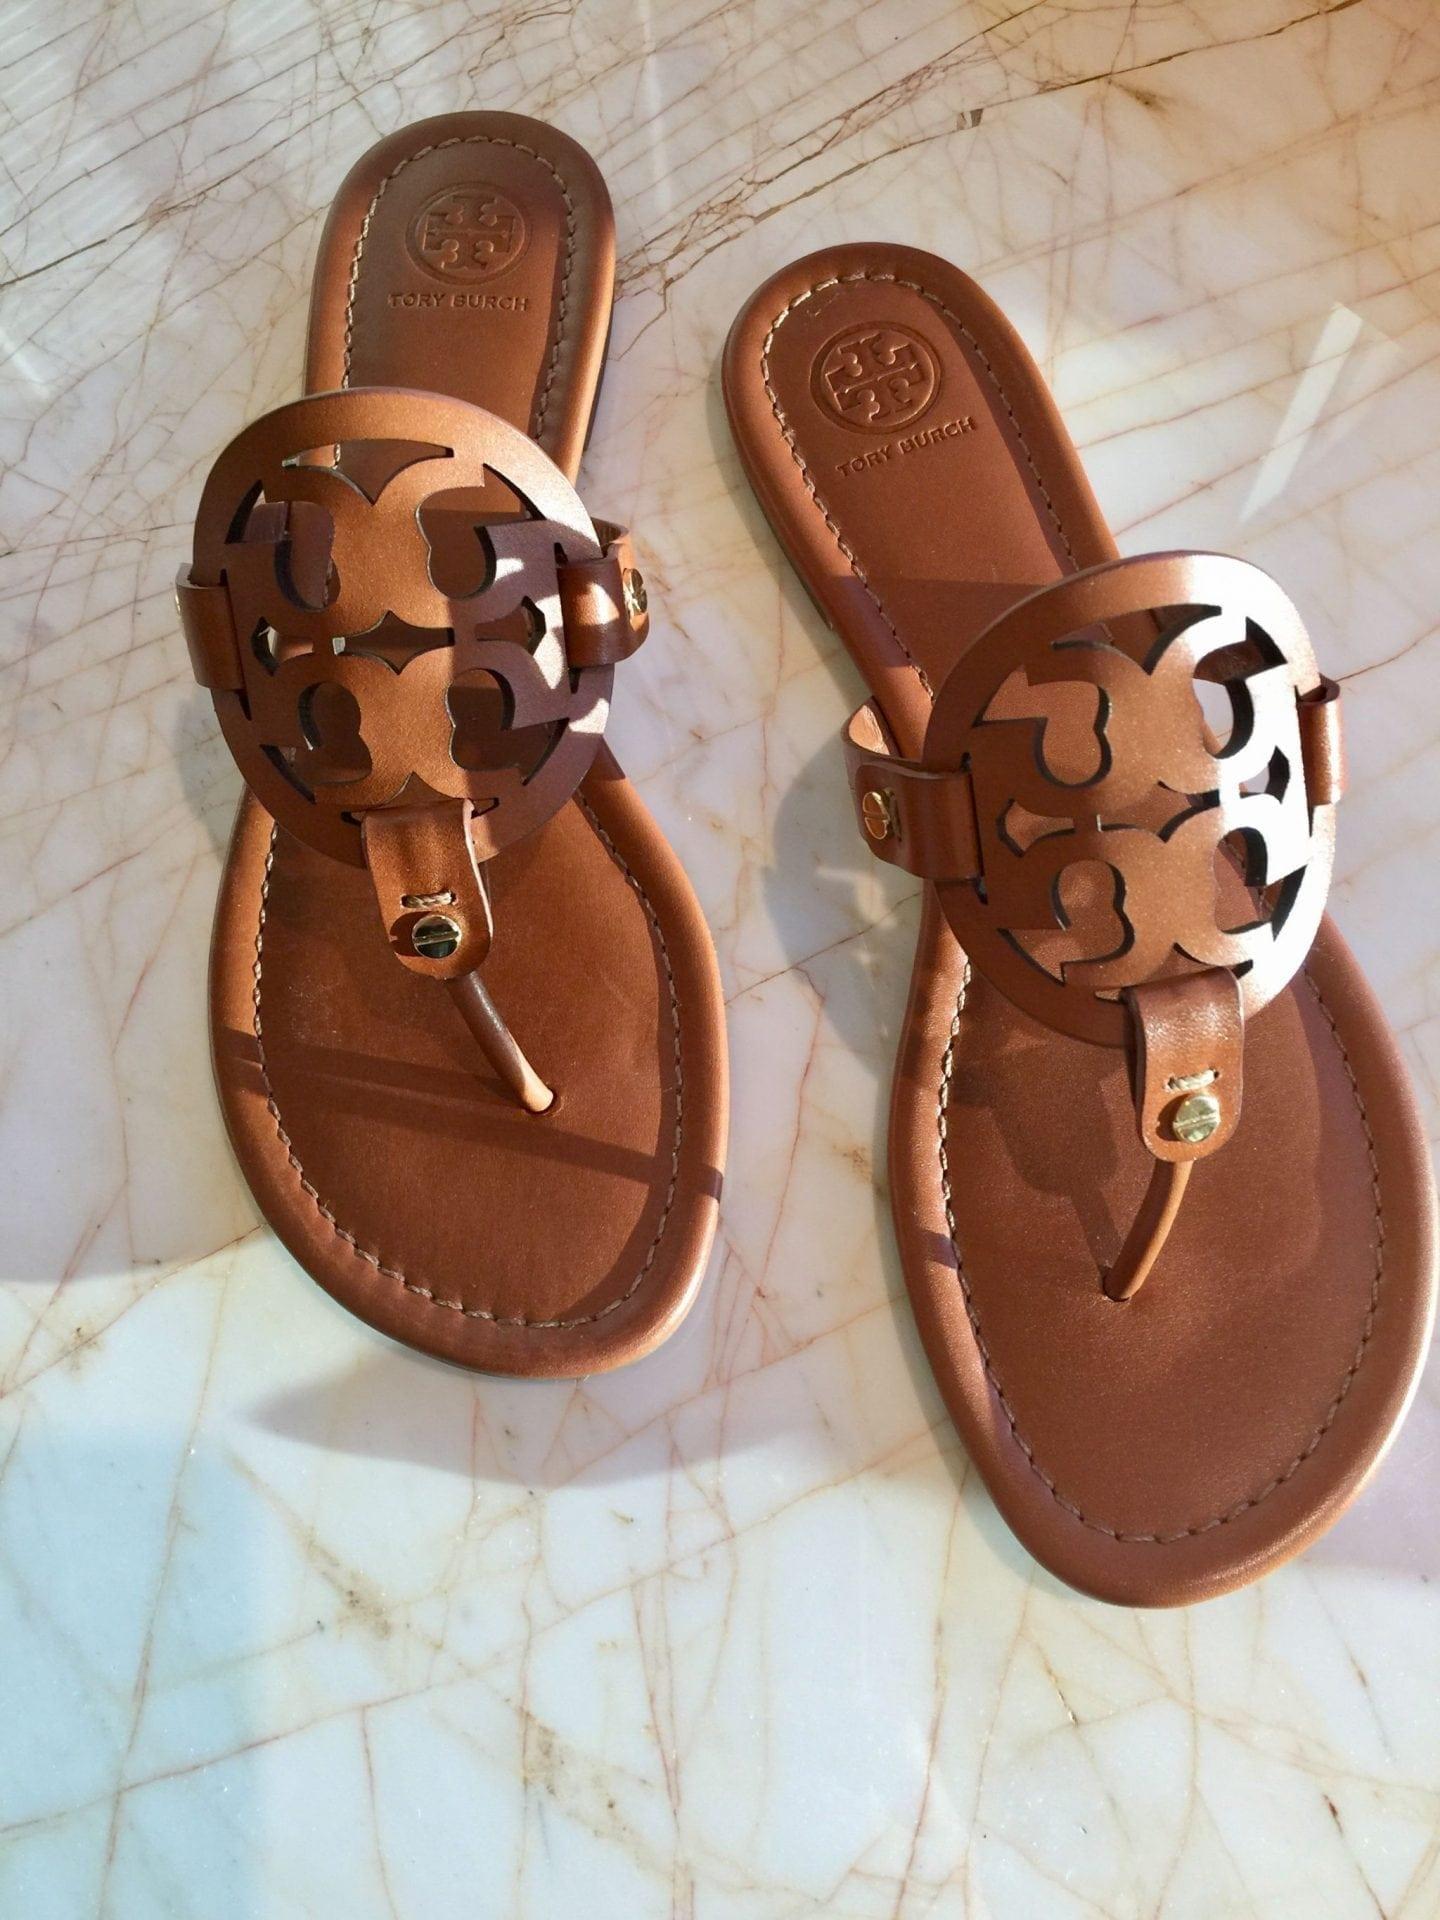 c40ab736815de My Summer Sandals  Tory Burch Miller Sandal in Vintage Vachetta Leather